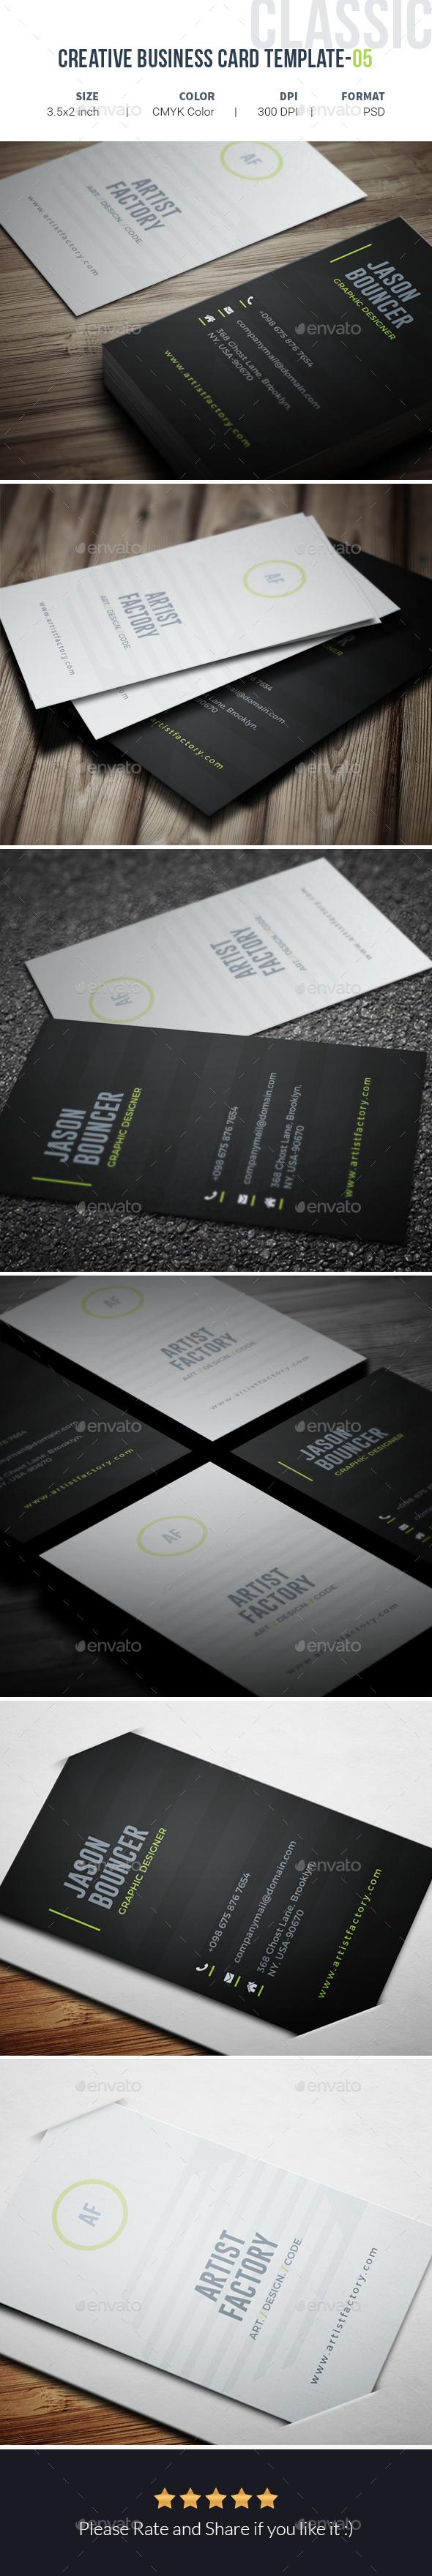 Creative Business Card Template-05 - Creative Business Cards